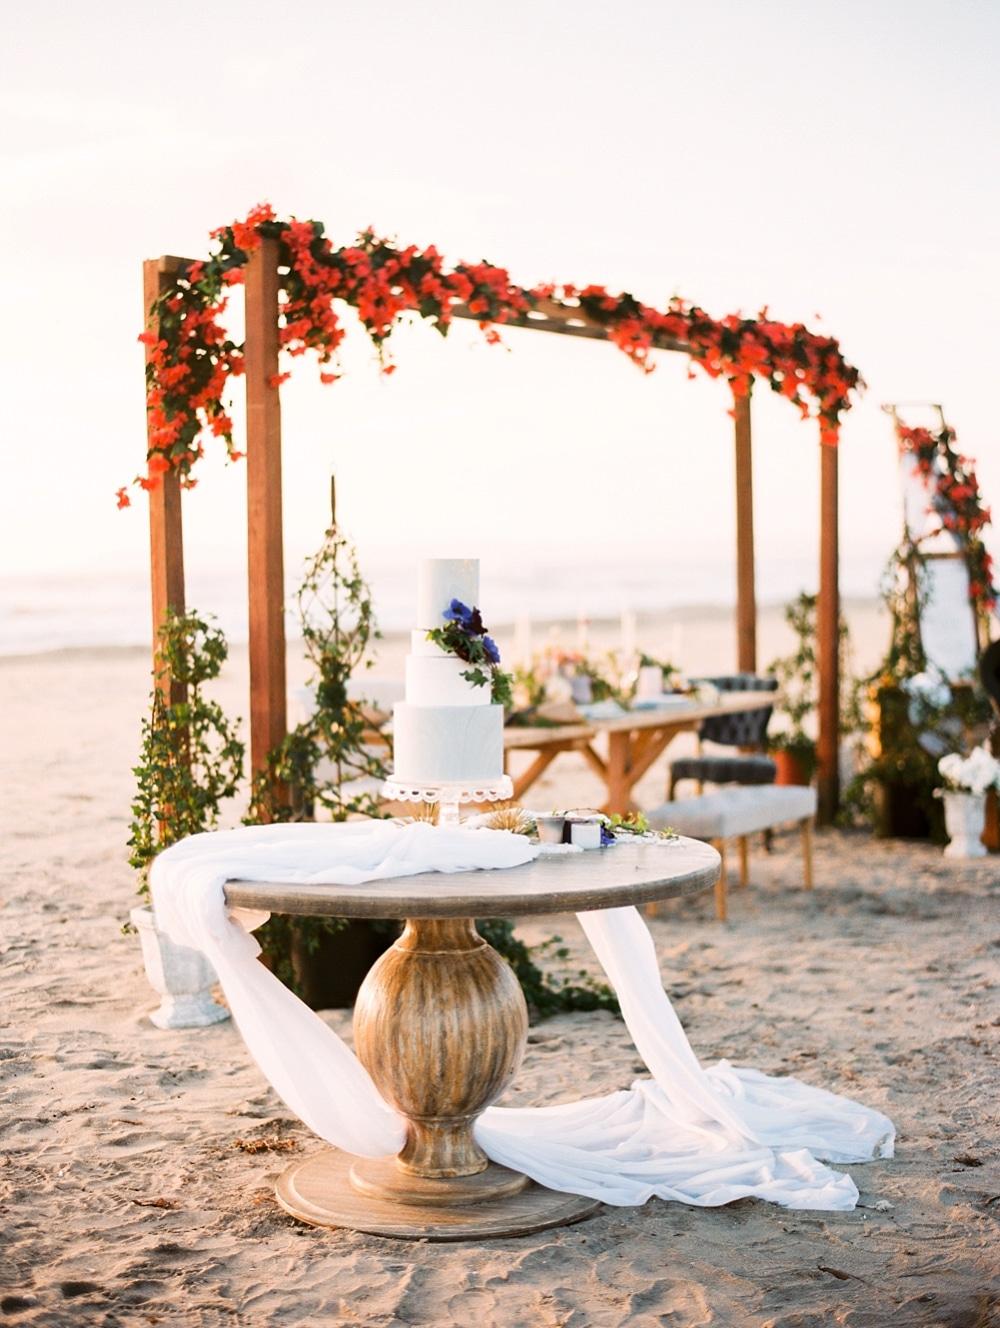 Kristin-La-Voie-Photography-San-Diego-Wedding-Photographer-2